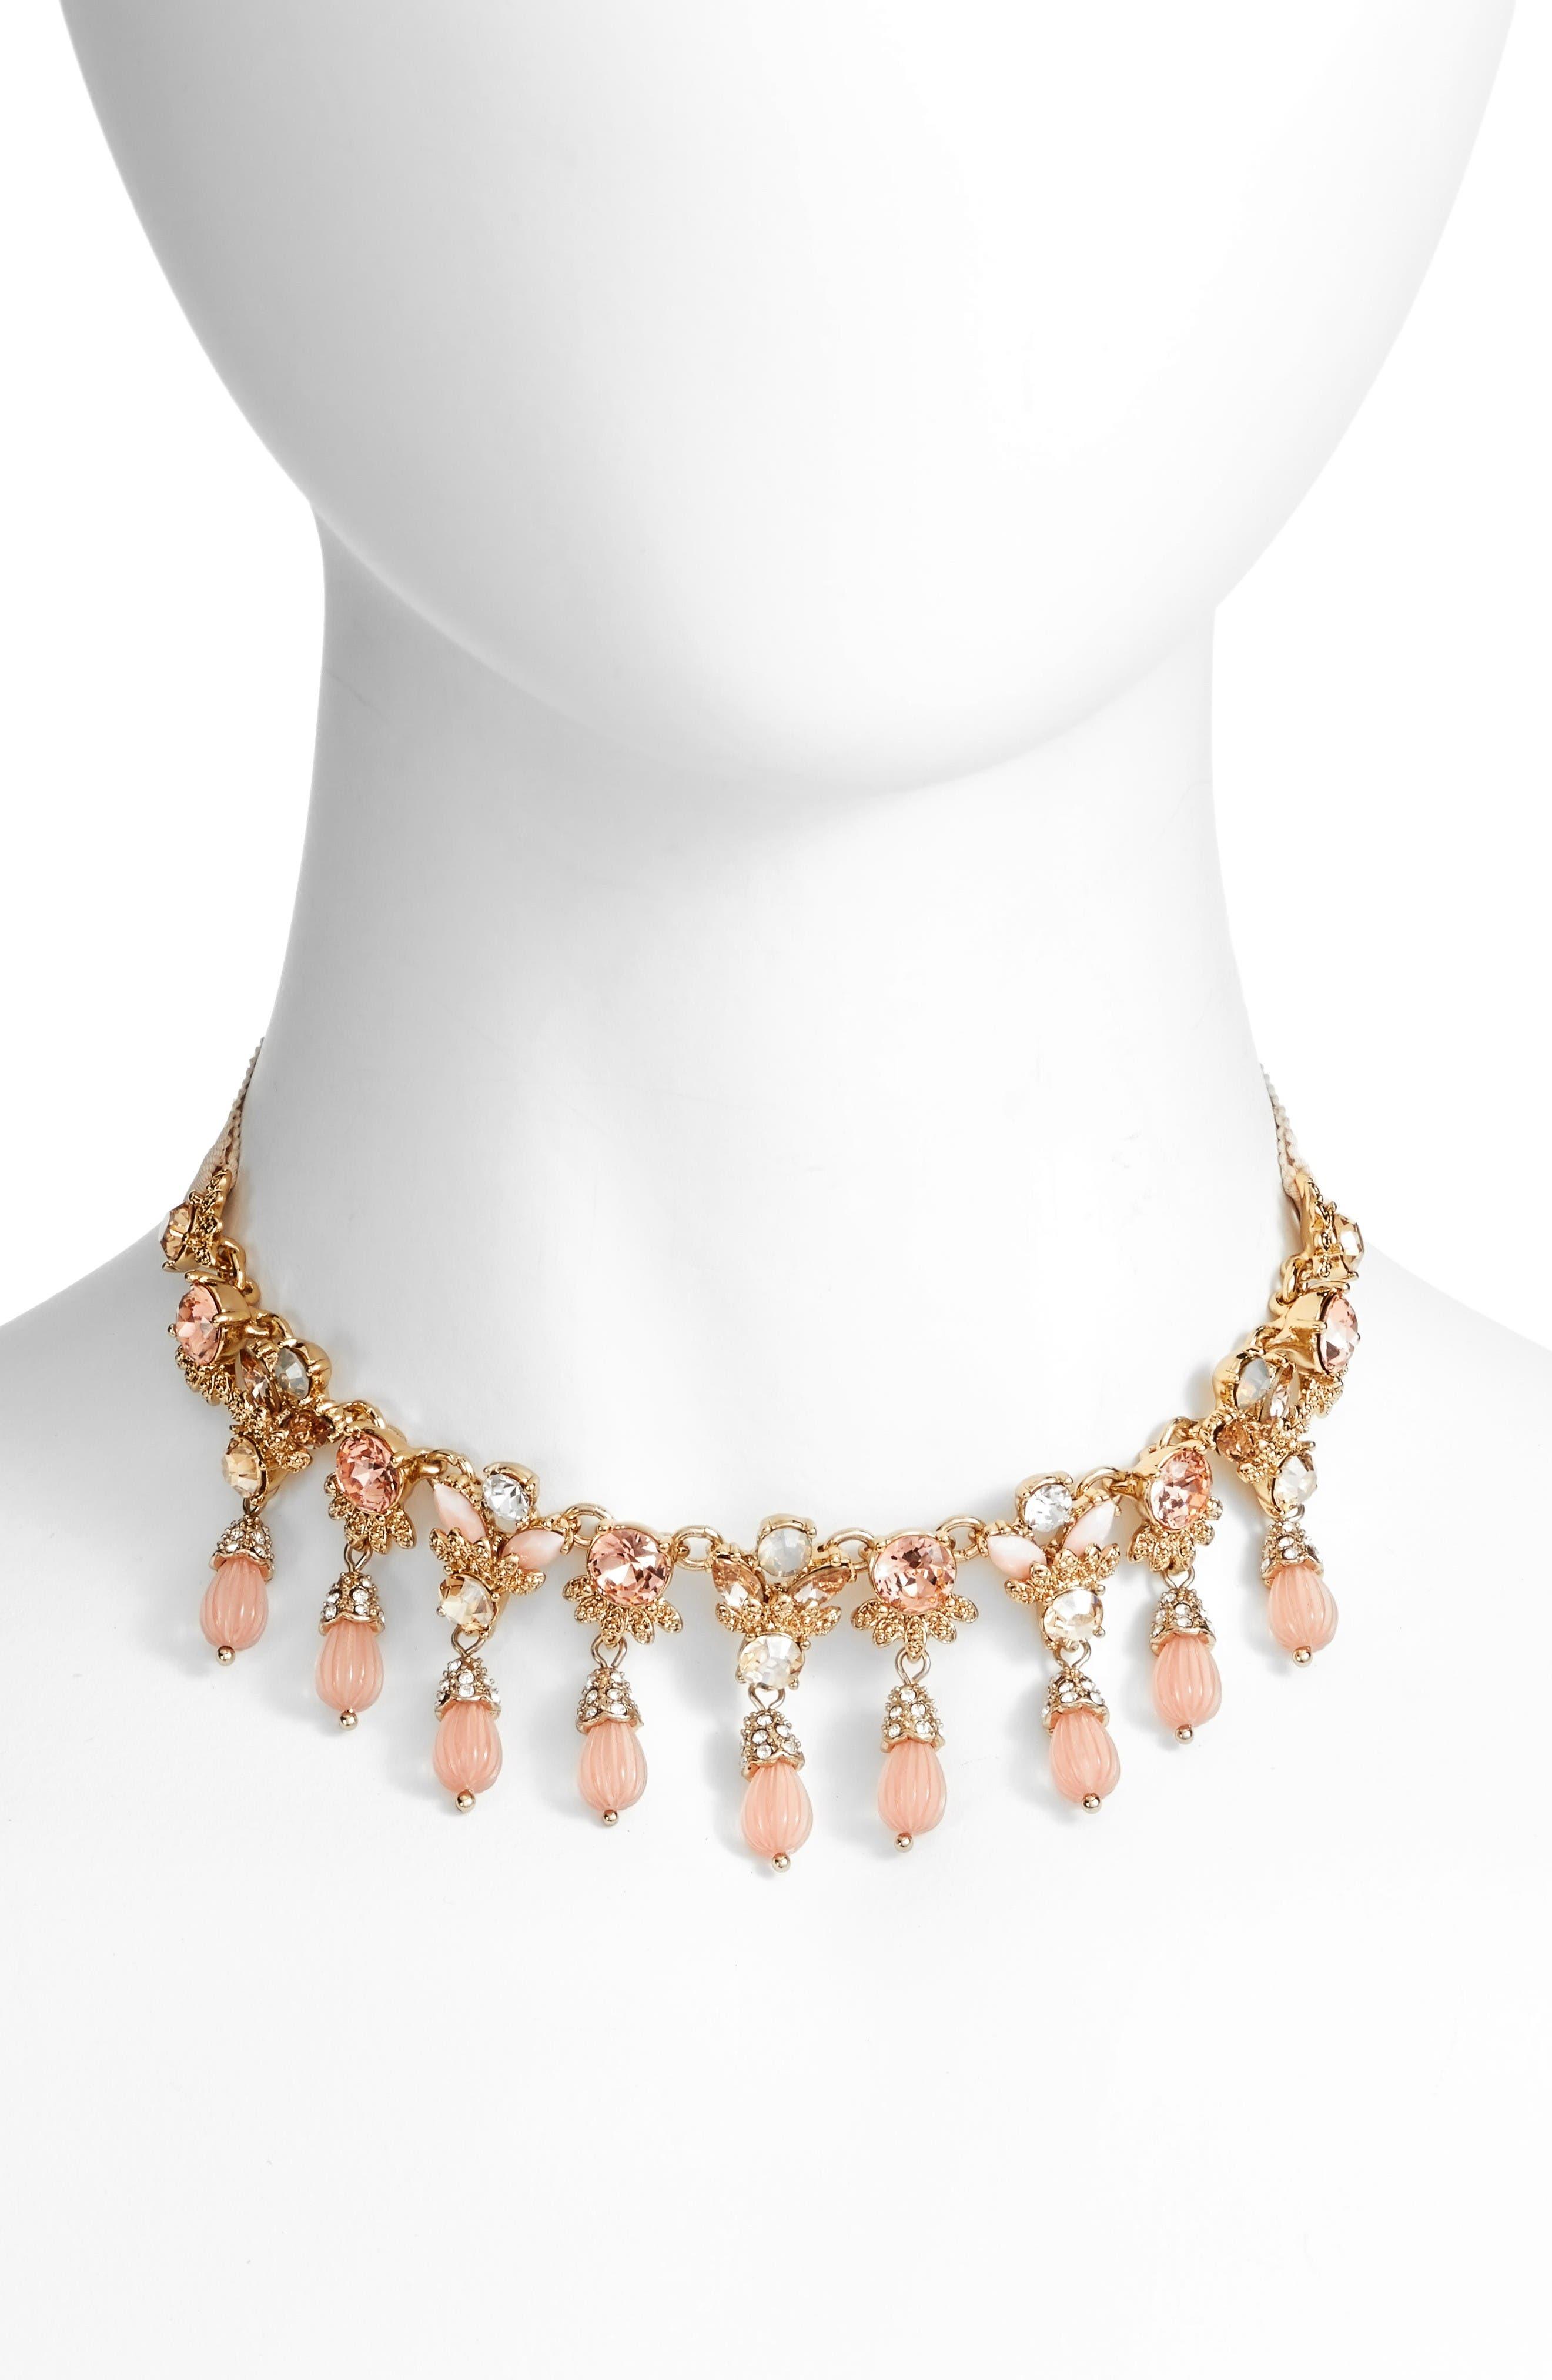 Adjustable Necklace,                             Main thumbnail 1, color,                             Blush / Gold